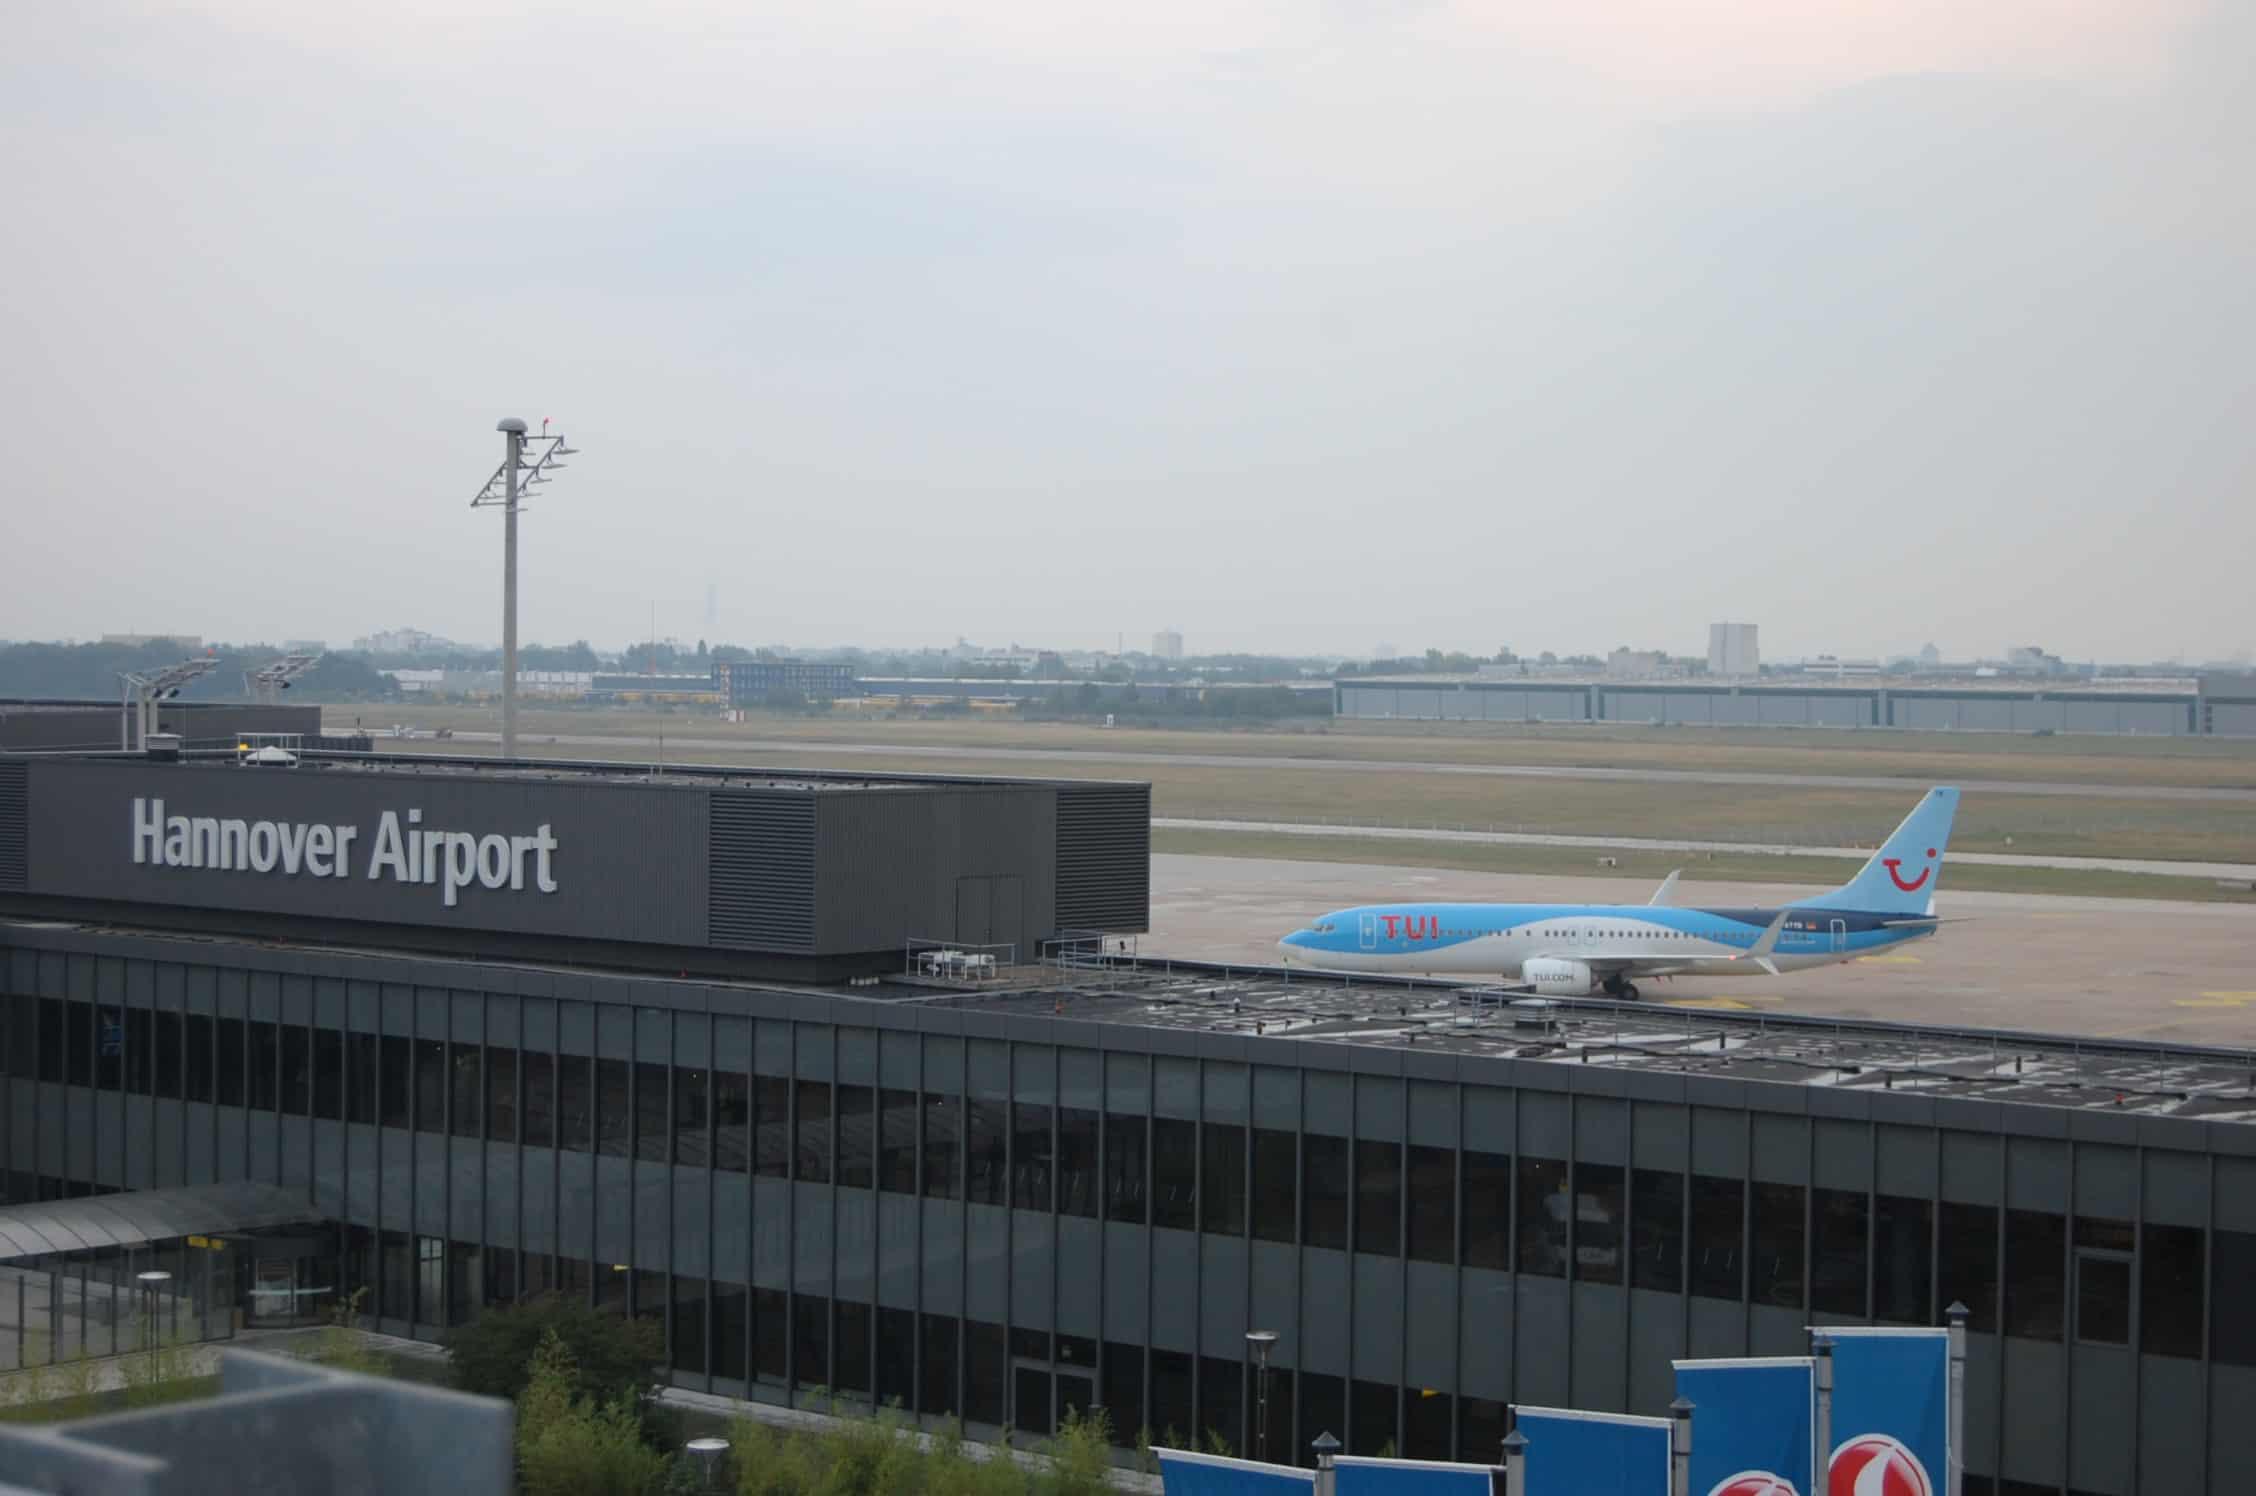 TUI fly Flugzeug am HAJ Airport